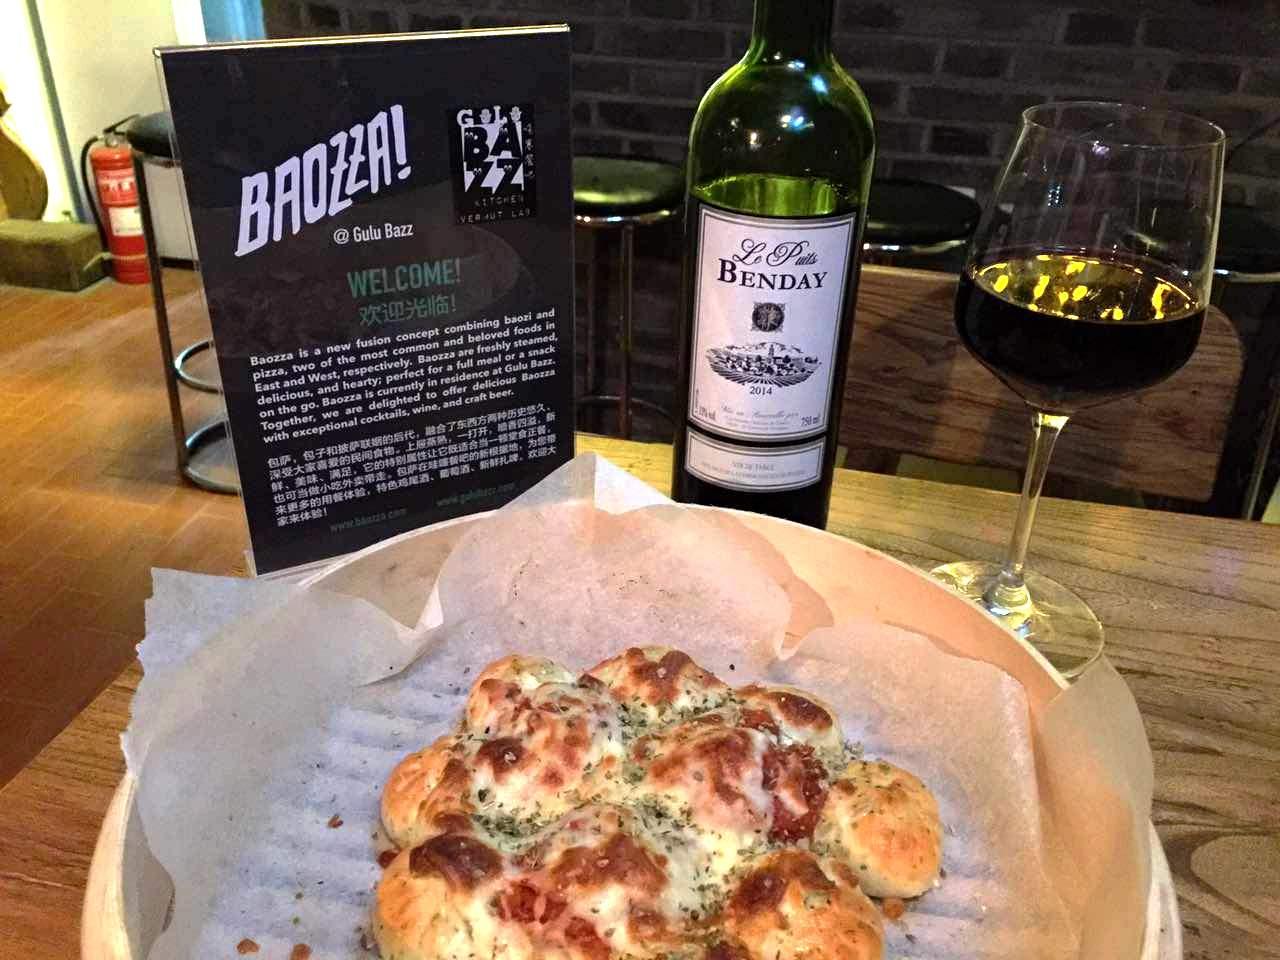 Blazing Buns: Baozza Begins Residency at Gulu Bazz With Flambé Dessert Bao and More